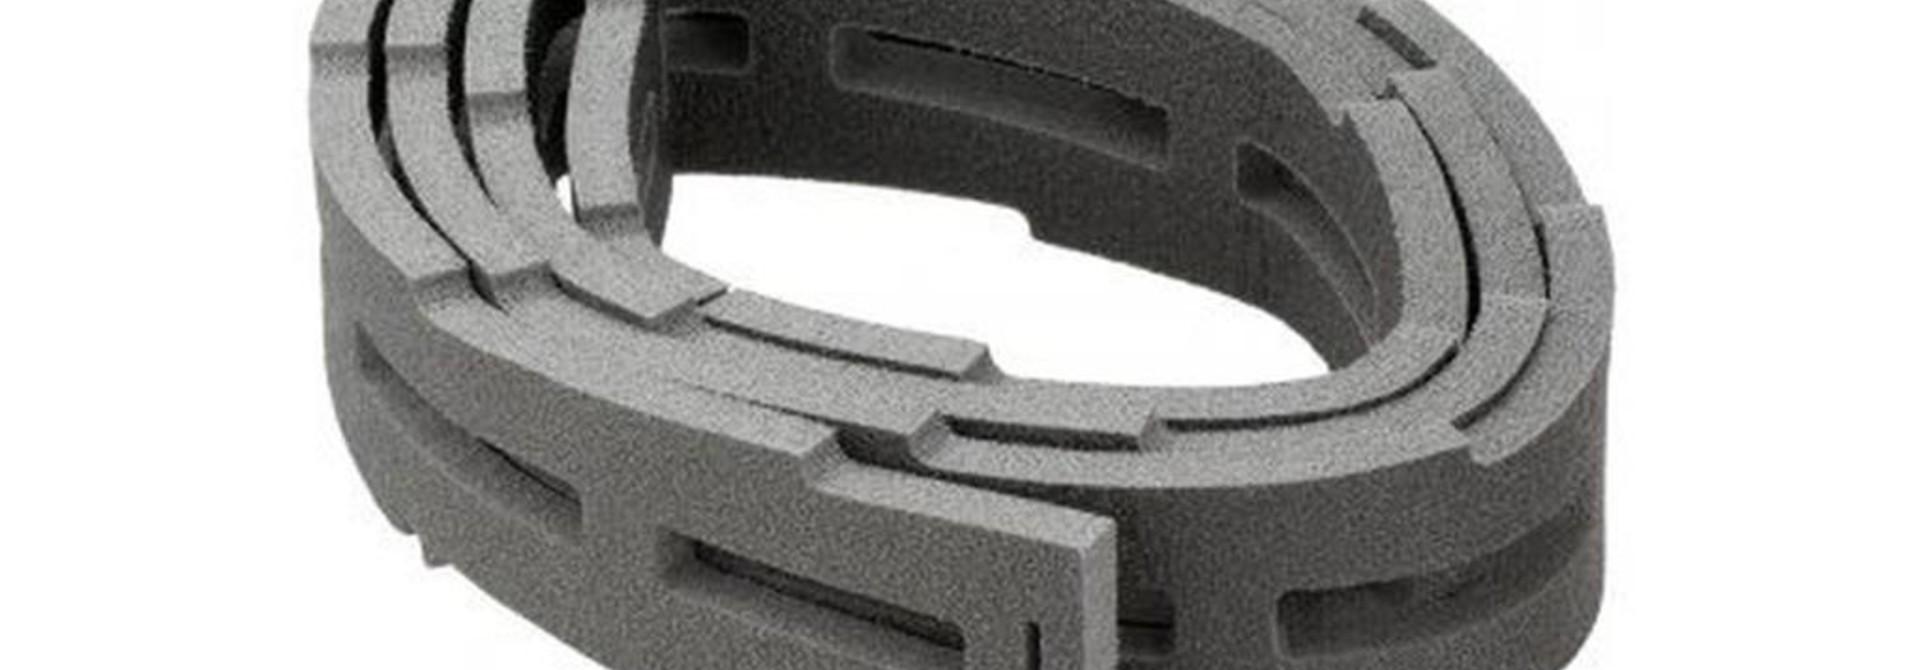 Huck Norris Tire Insert, 23mm - 33mm